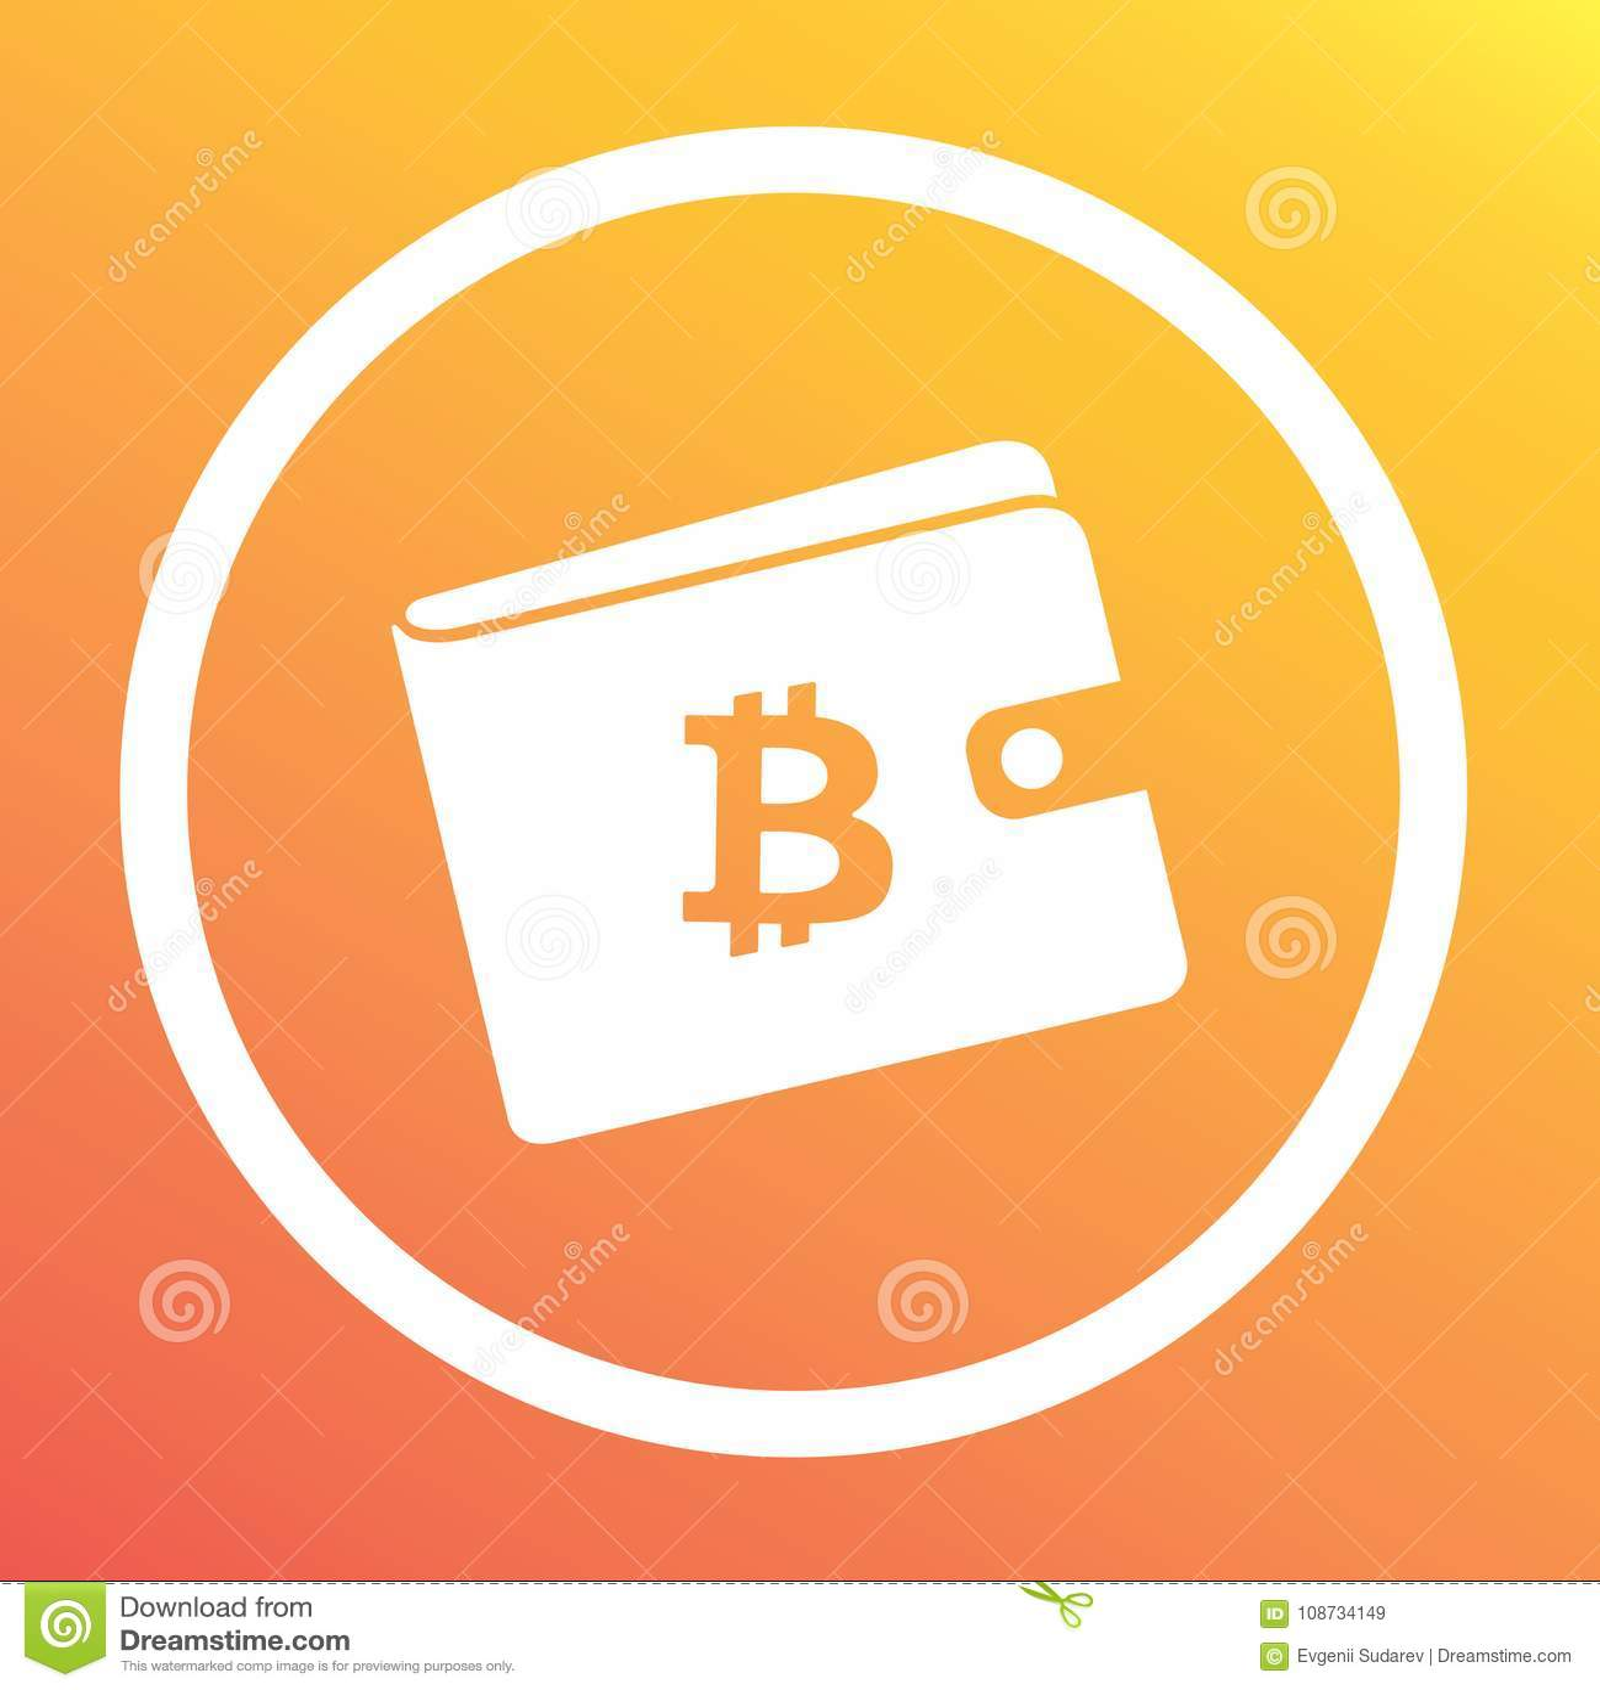 Bitcoin White Wallet With Logo On Orange Background